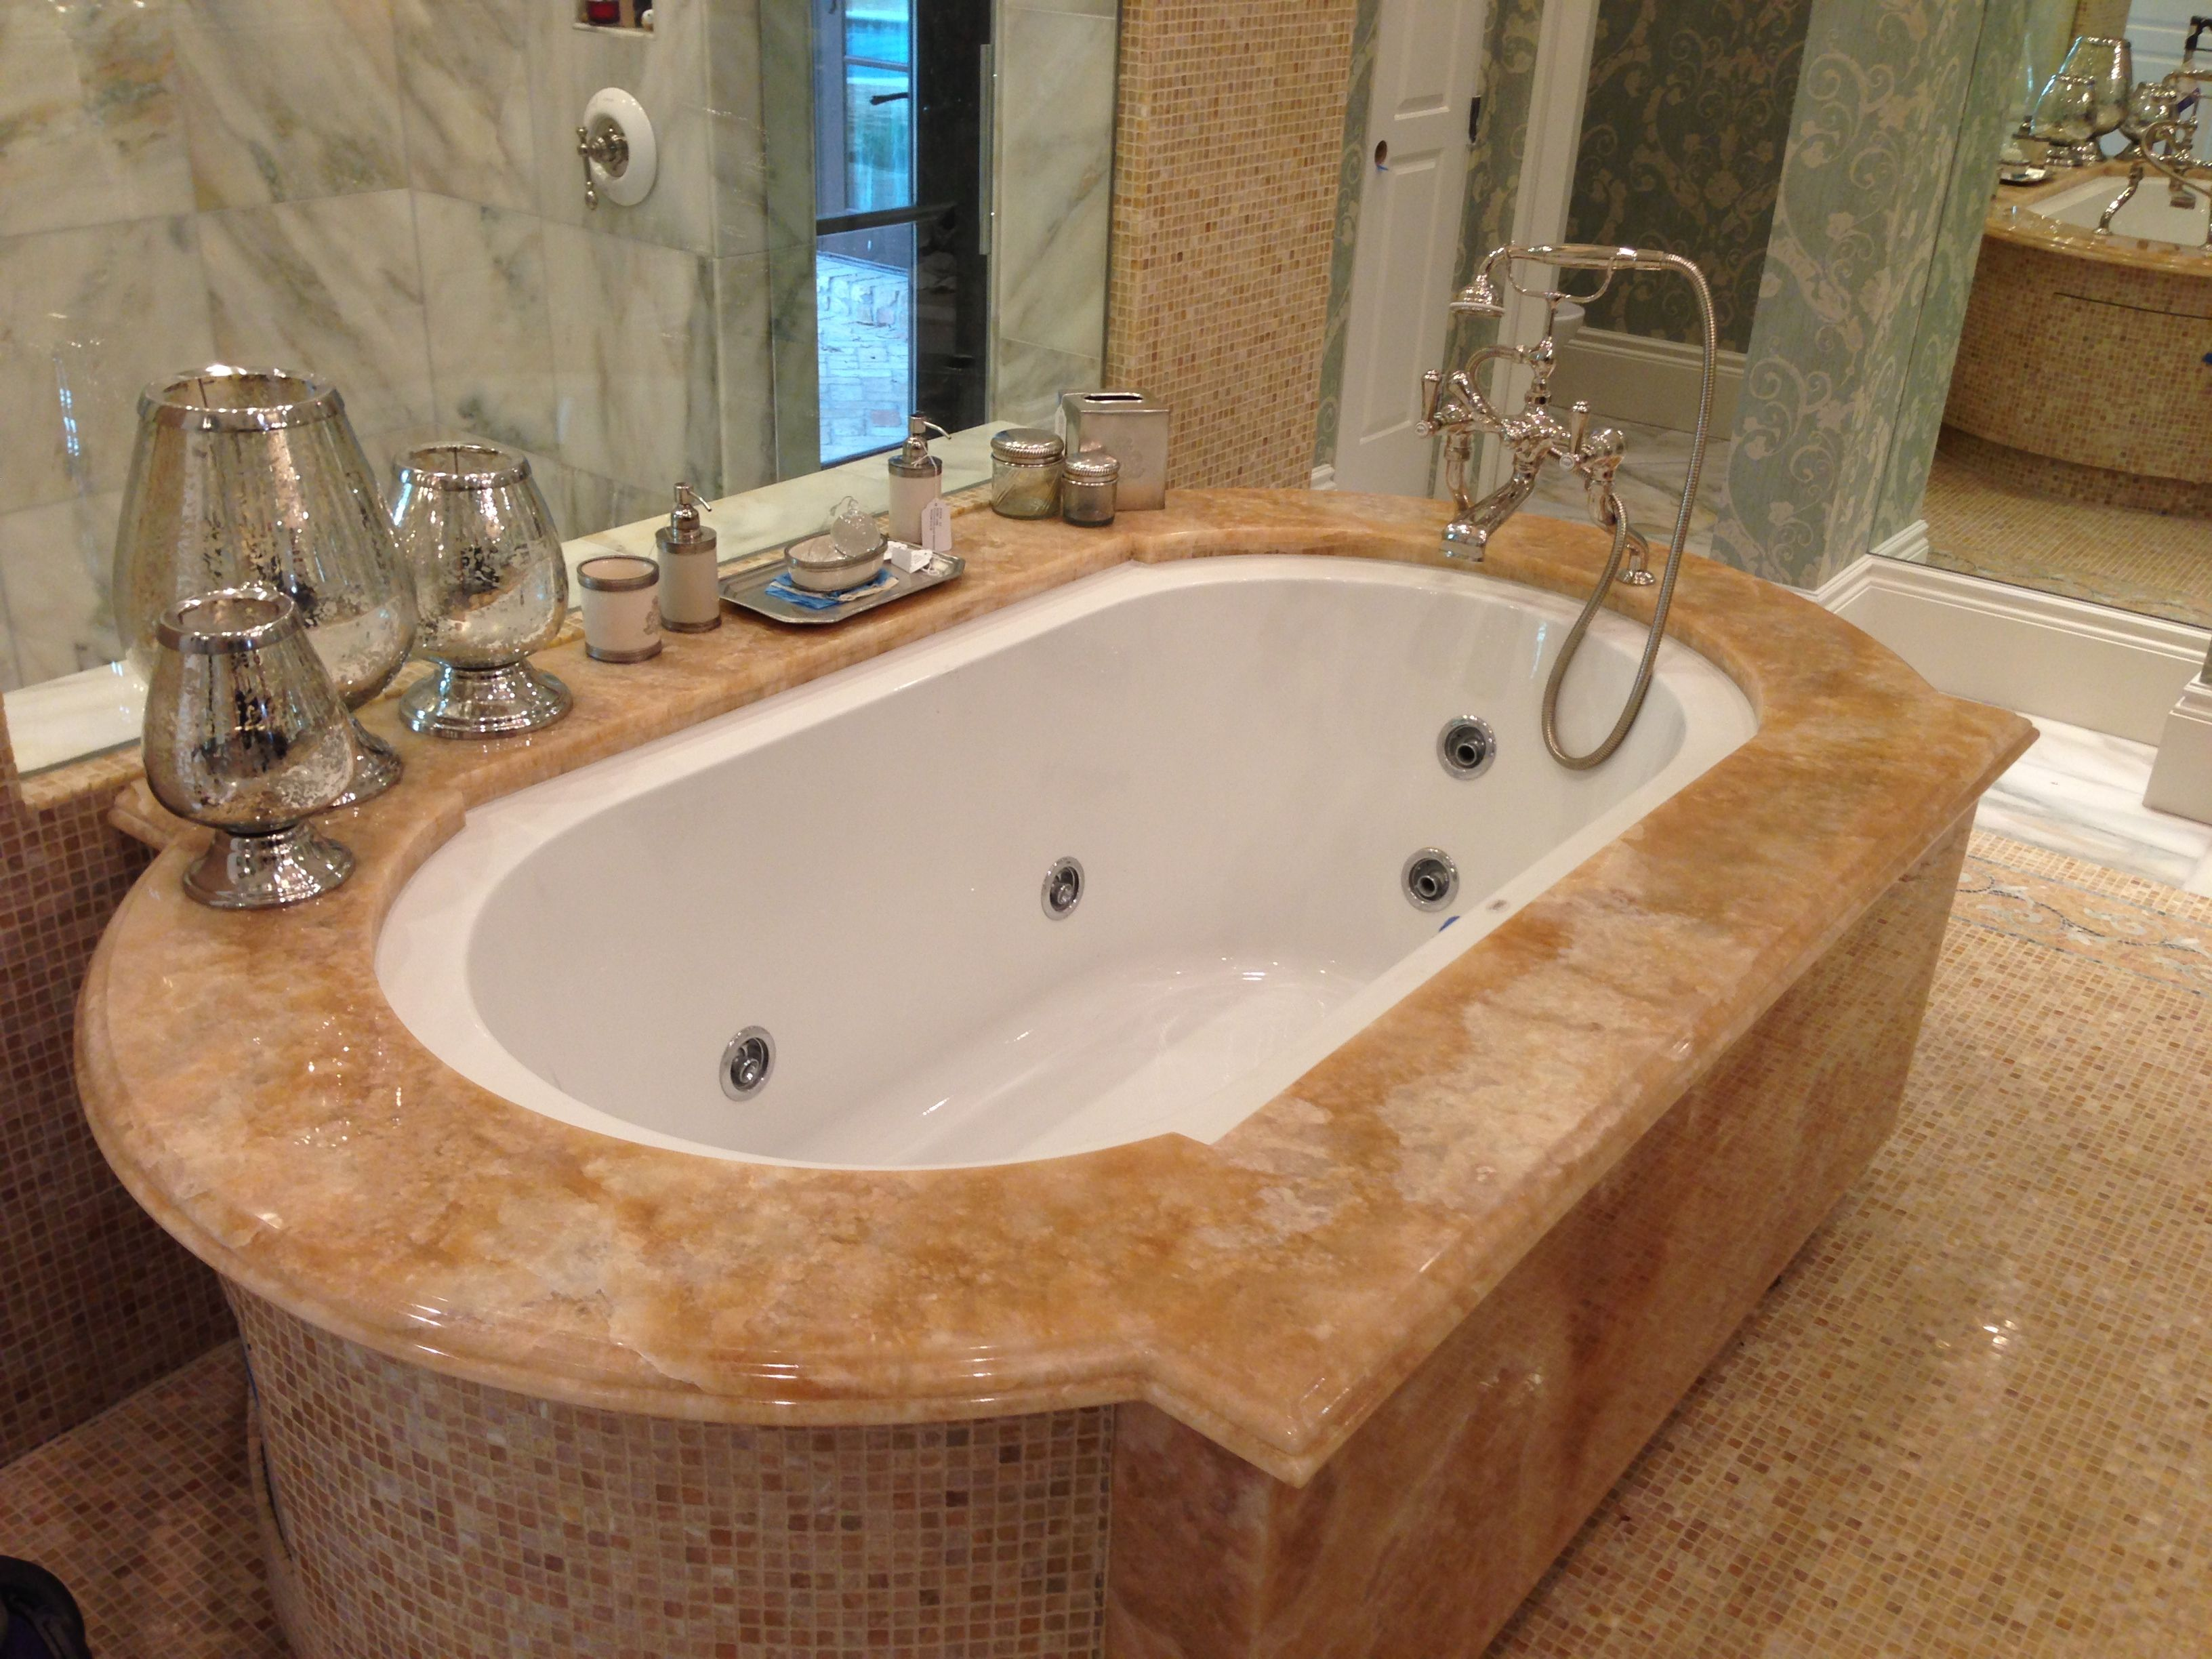 Brown / Tan / White Granite Bathtub | ADP Surfaces of Orlando